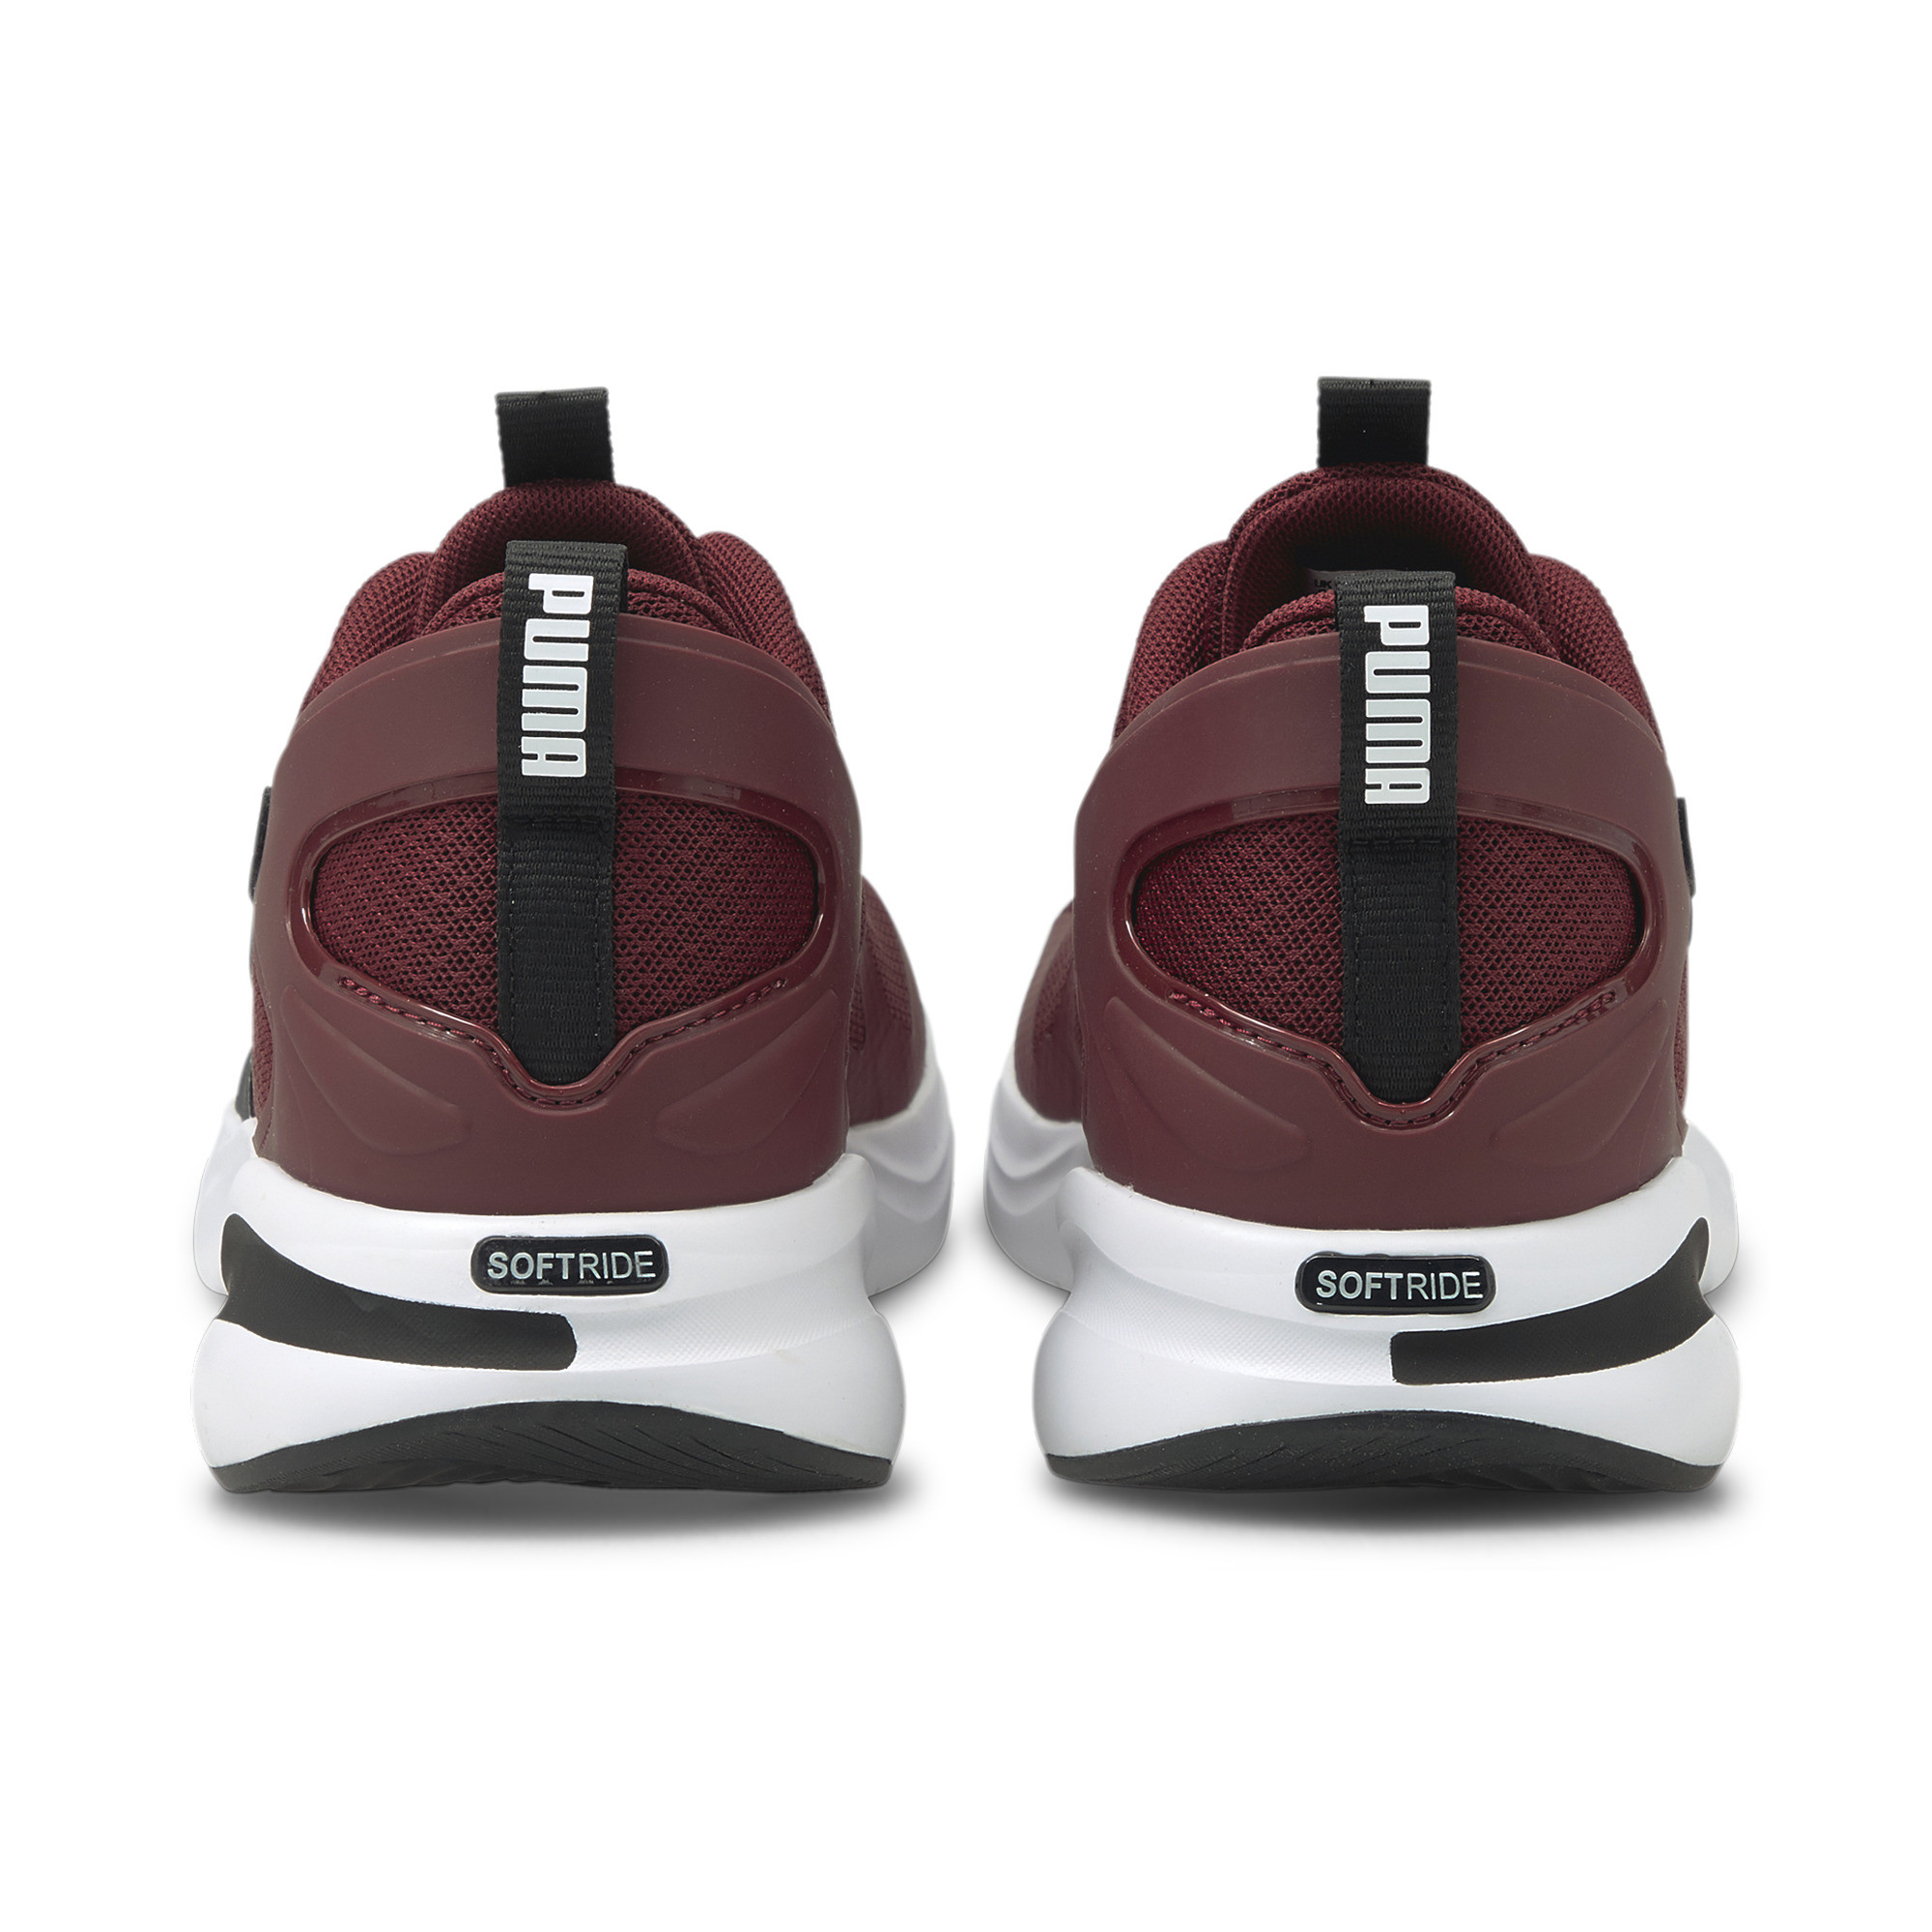 thumbnail 18 - PUMA Men's SoftRide Rift Running Shoes